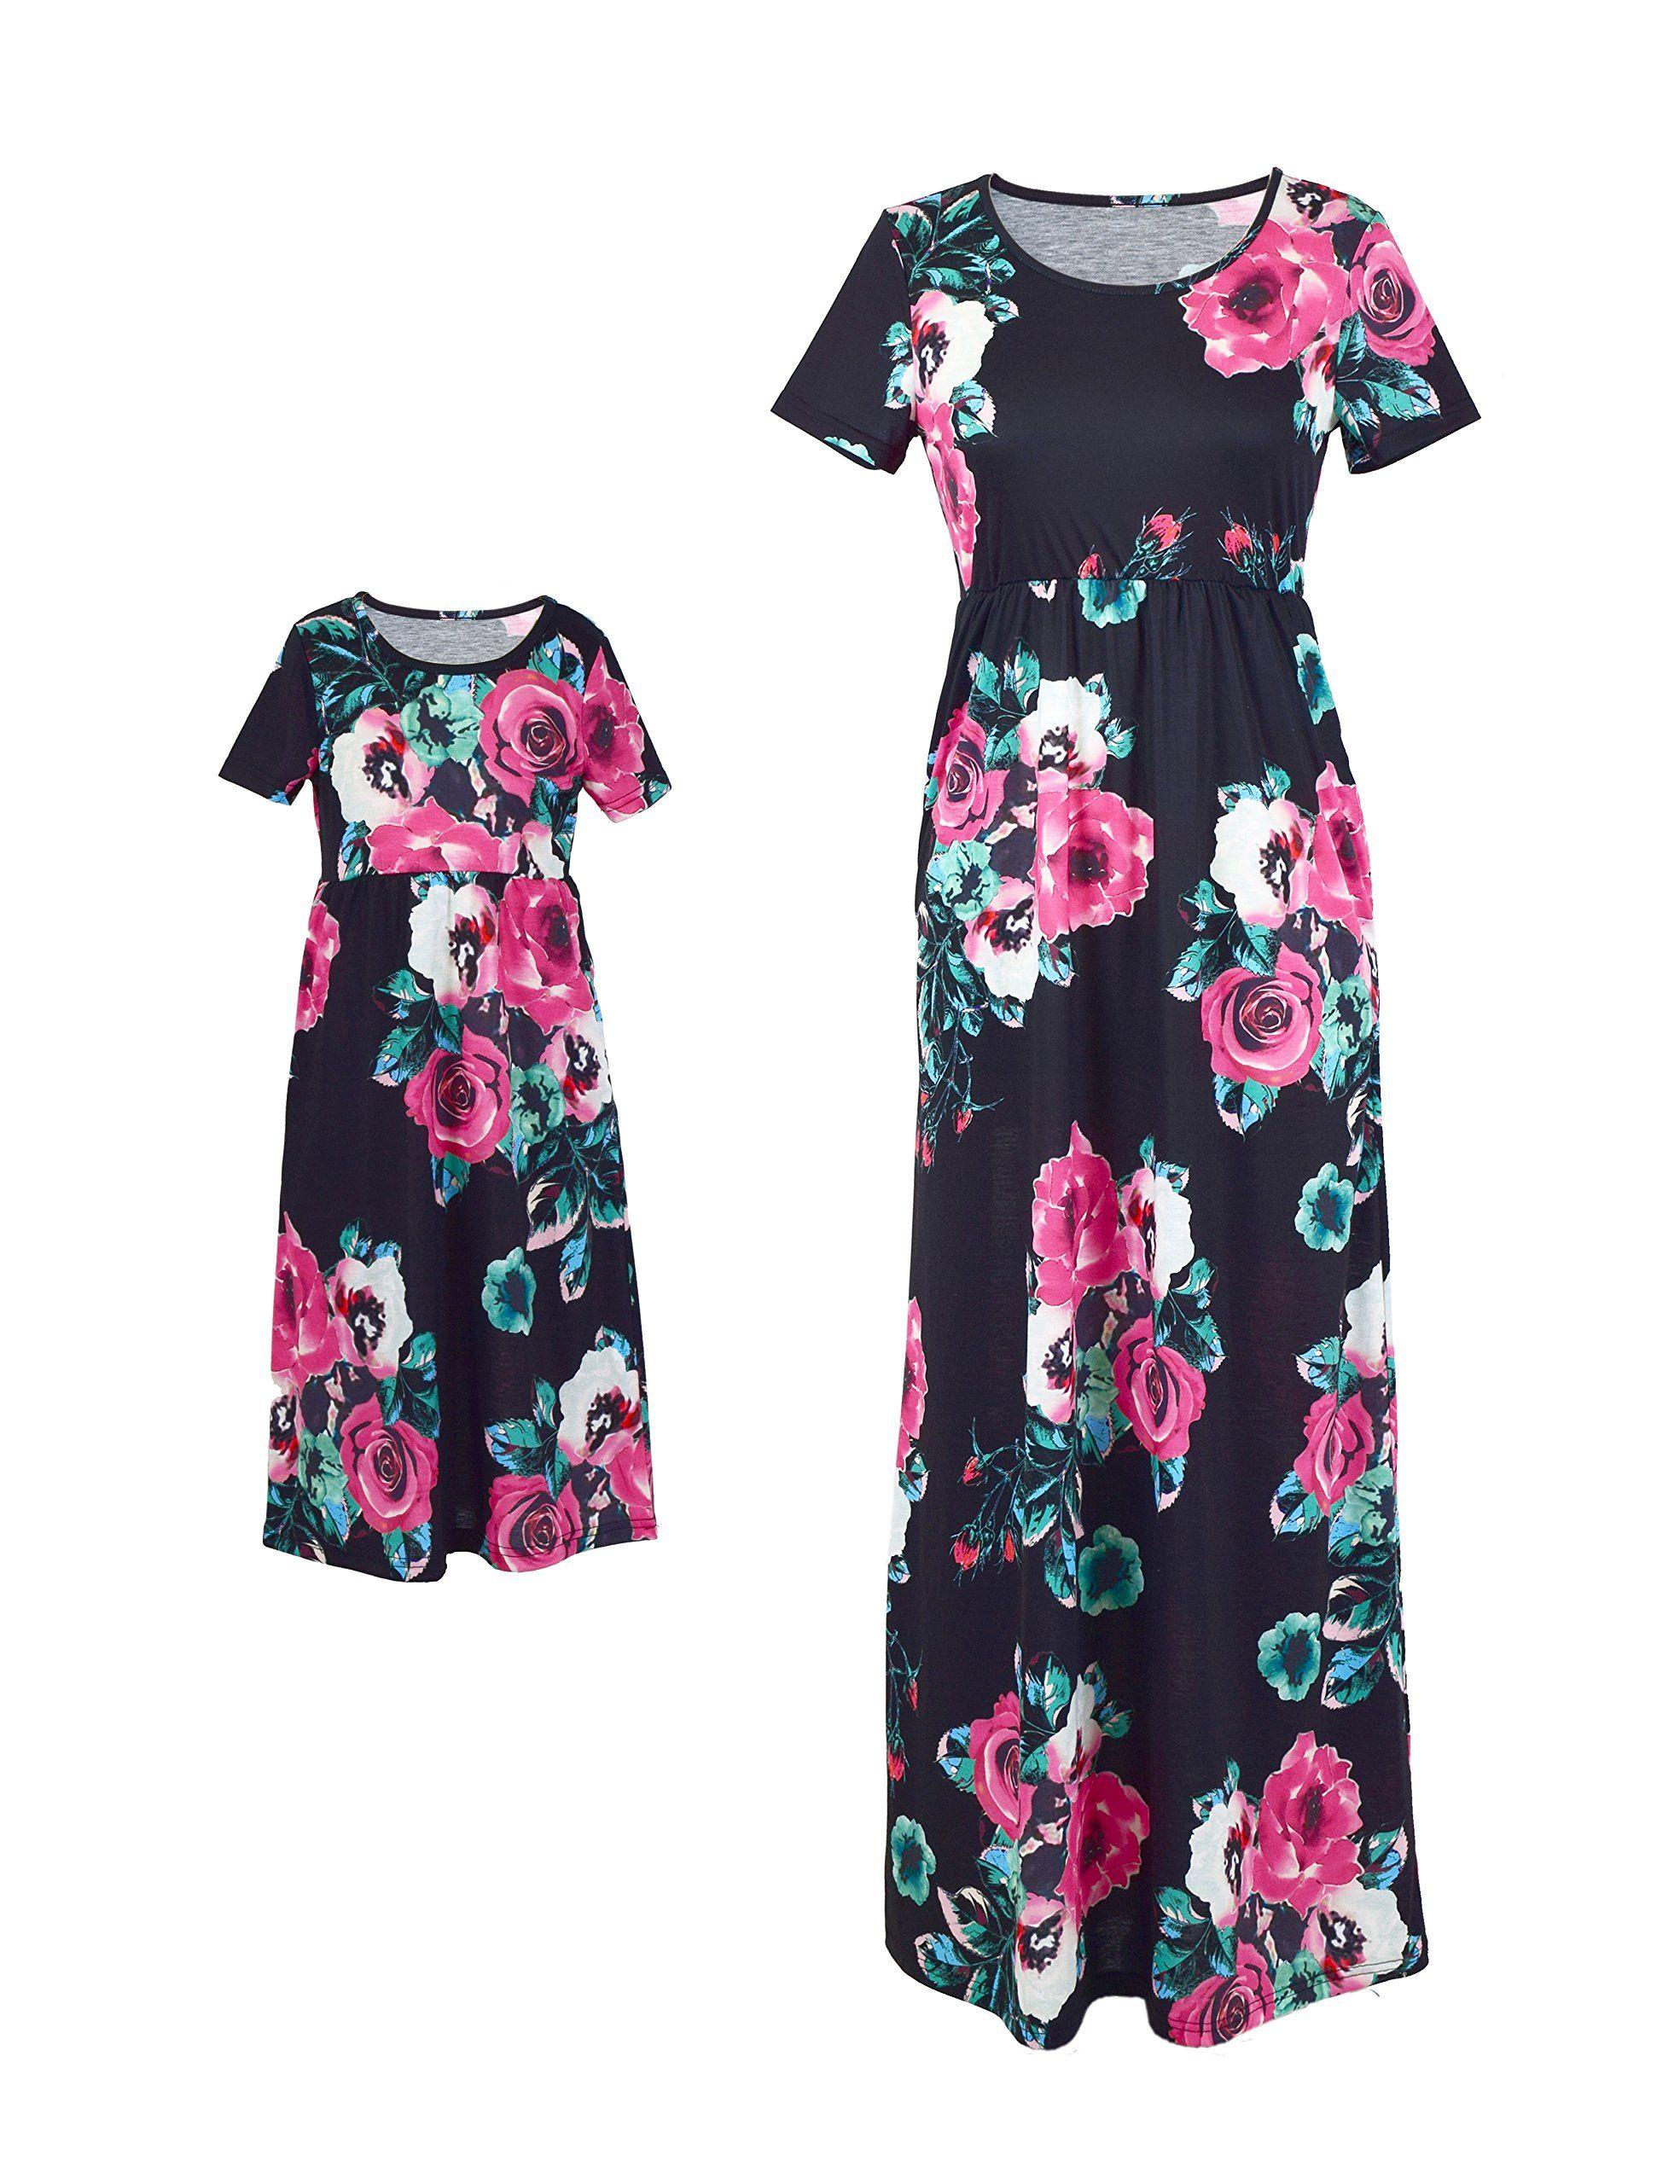 b3493e4ad Maternity Fashion - machine washable maternity dresses : FelinSoul Mother  Daughter Short Sleeve Family Matching Floral Maxi Dress SetsMOM XL Black  >>> You ...